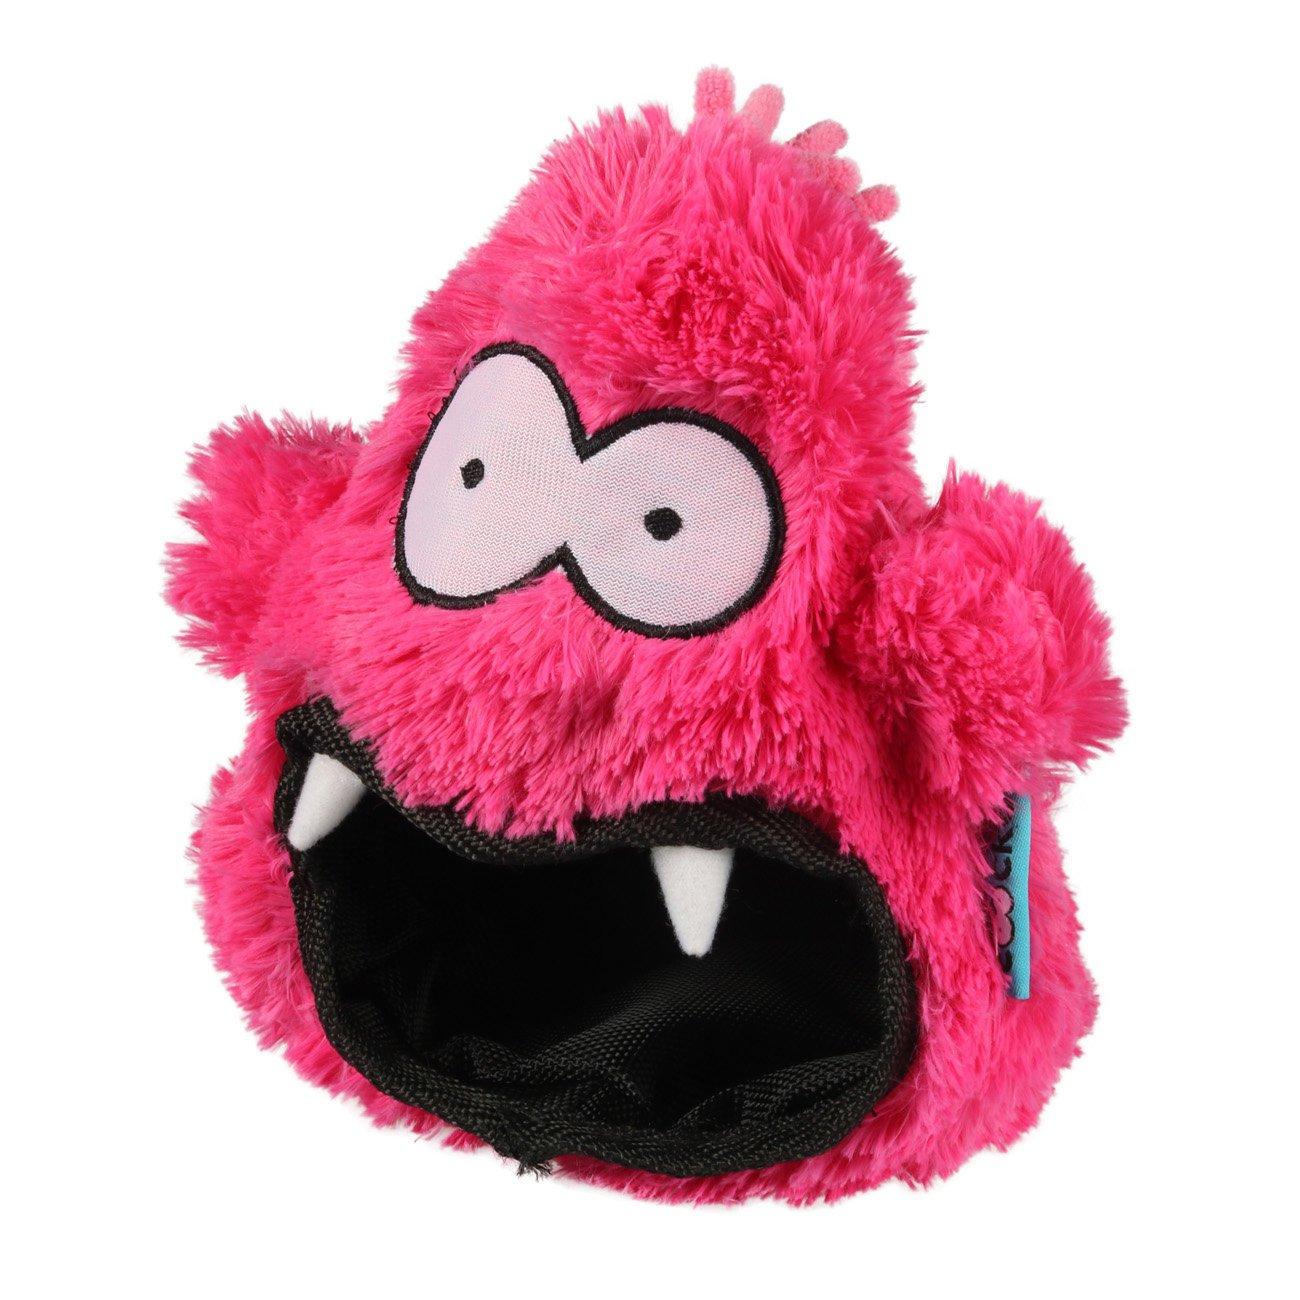 Coockoo Plüsch Monster Hundespielzeug, Bild 3